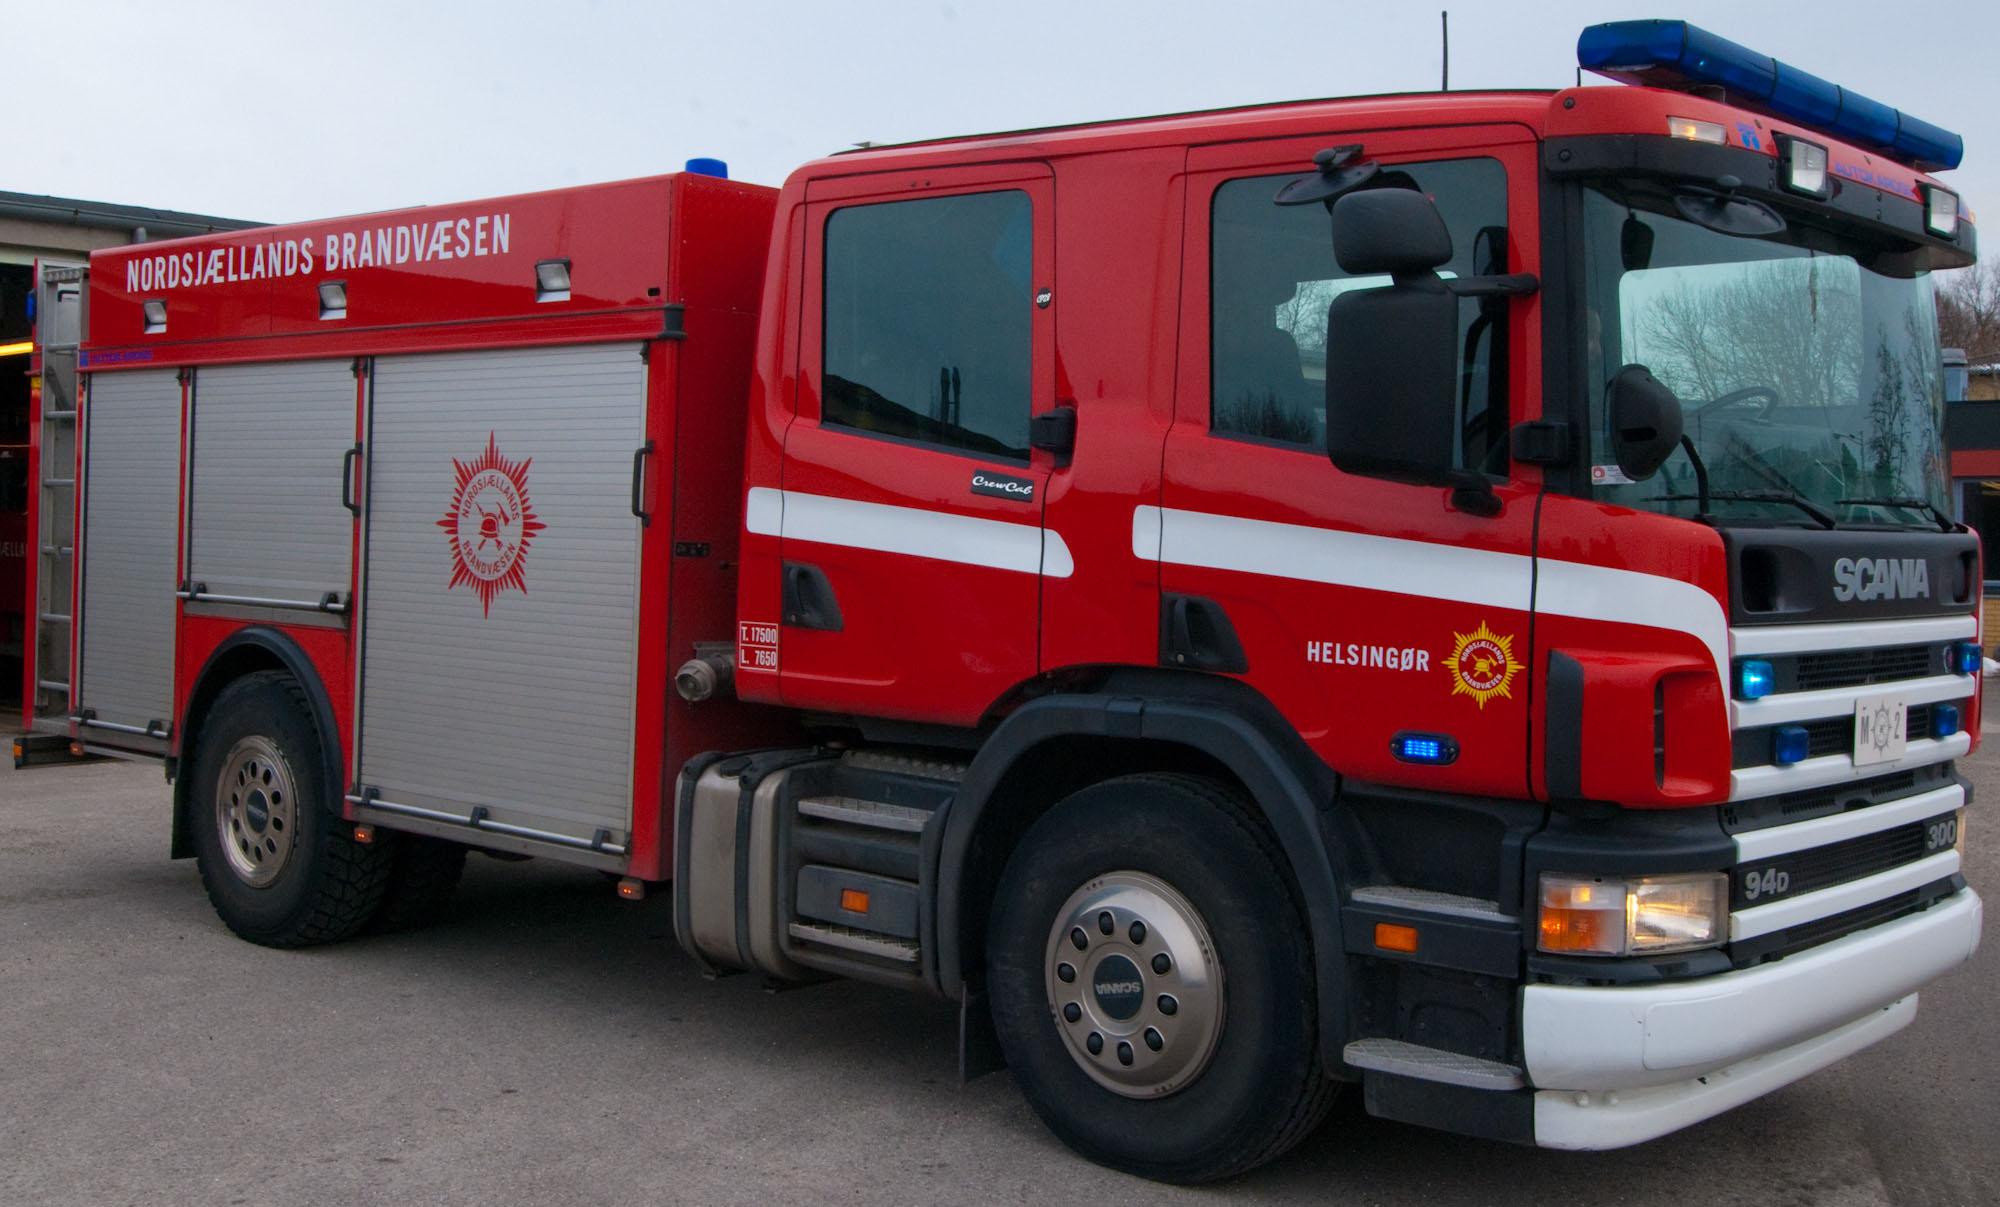 Firetruck_Helsing%C3%B8r_-_front_right.j